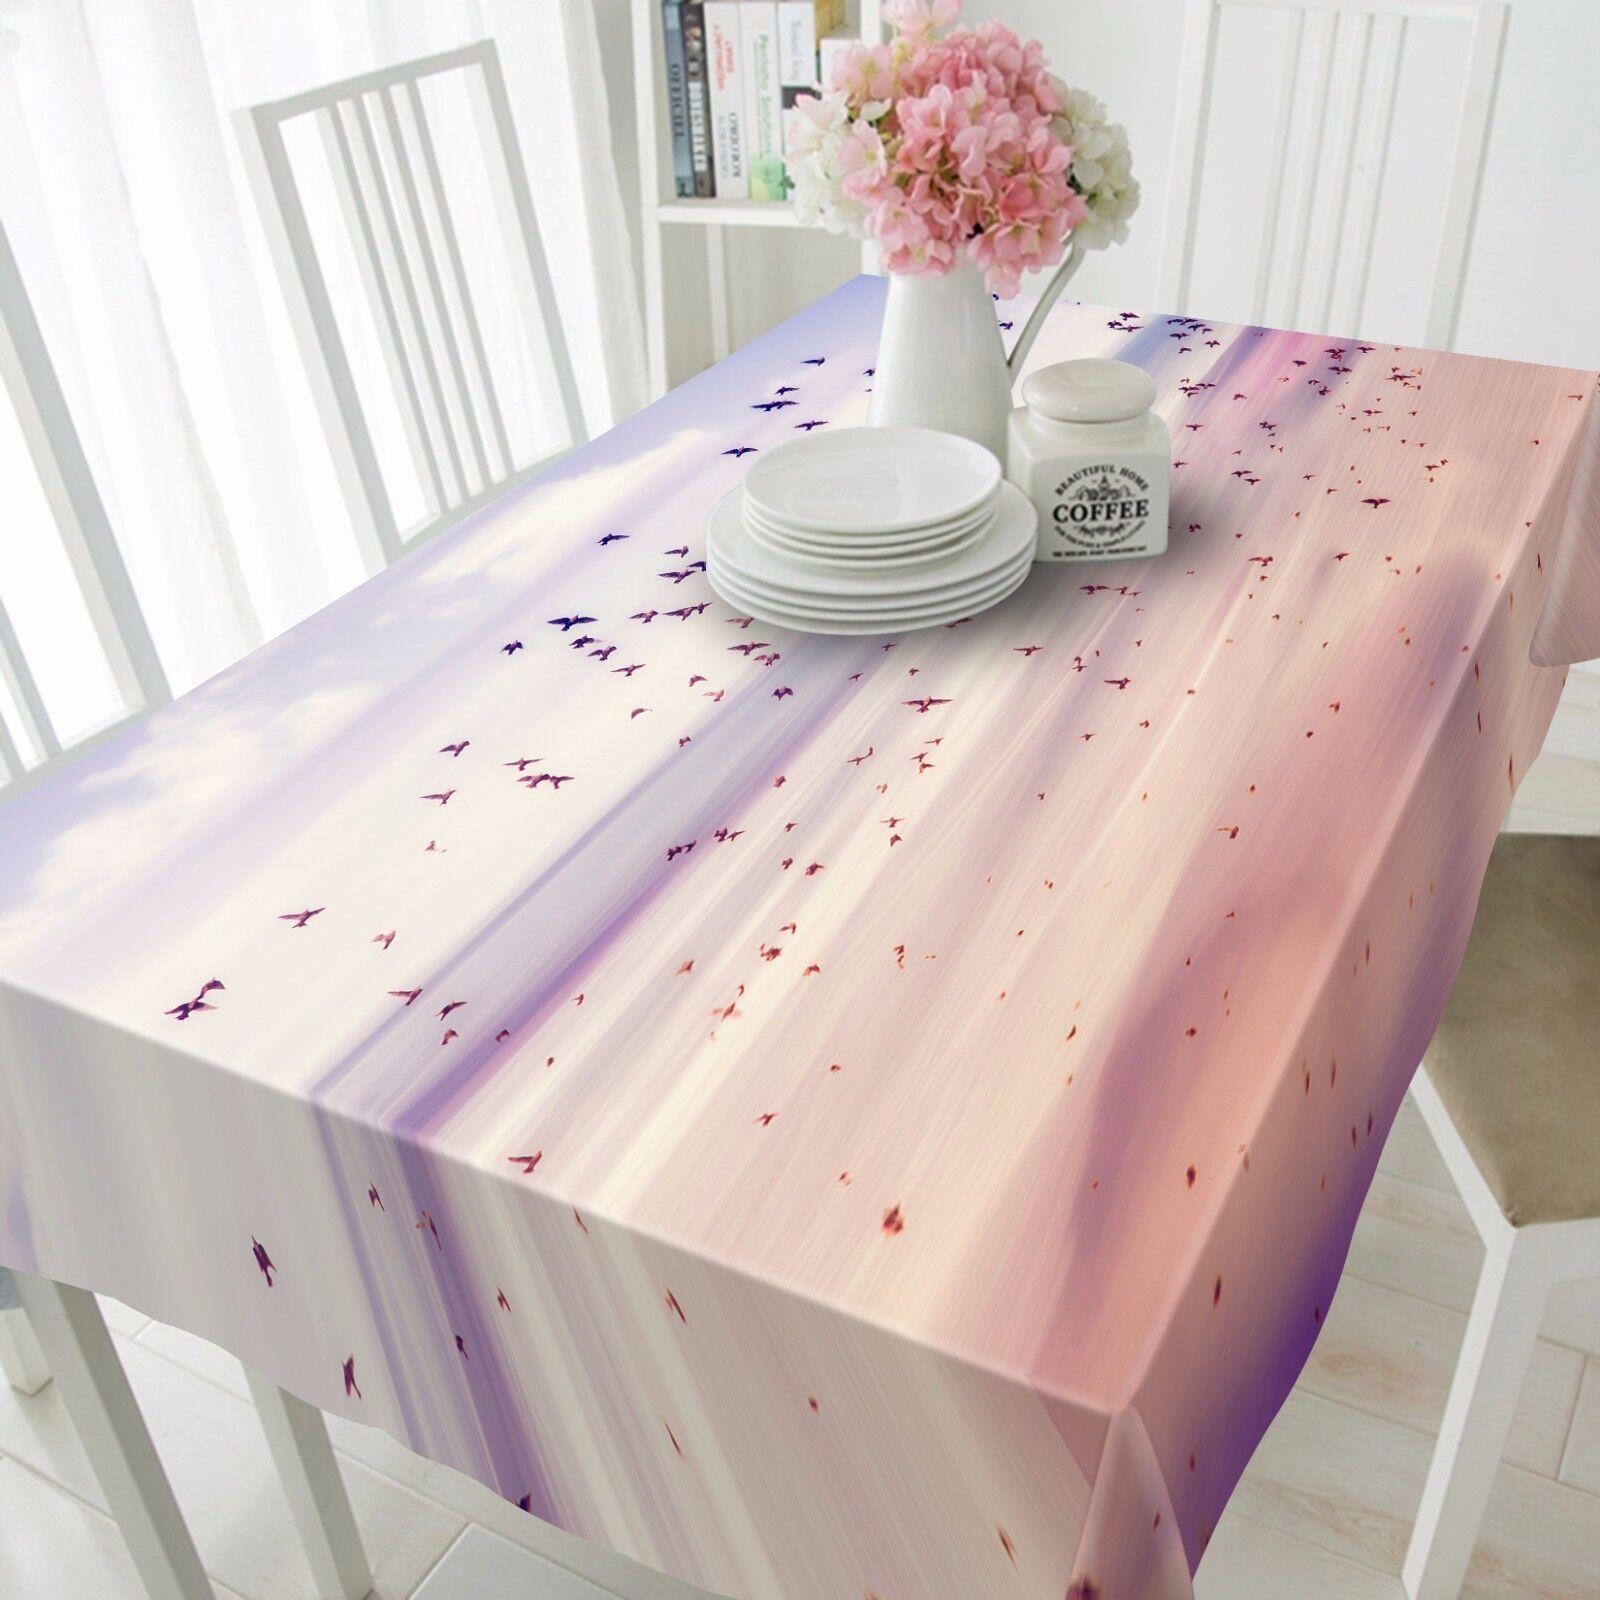 3D Bird 4499 Tablecloth Table Cover Cloth Birthday Party Event AJ WALLPAPER AU